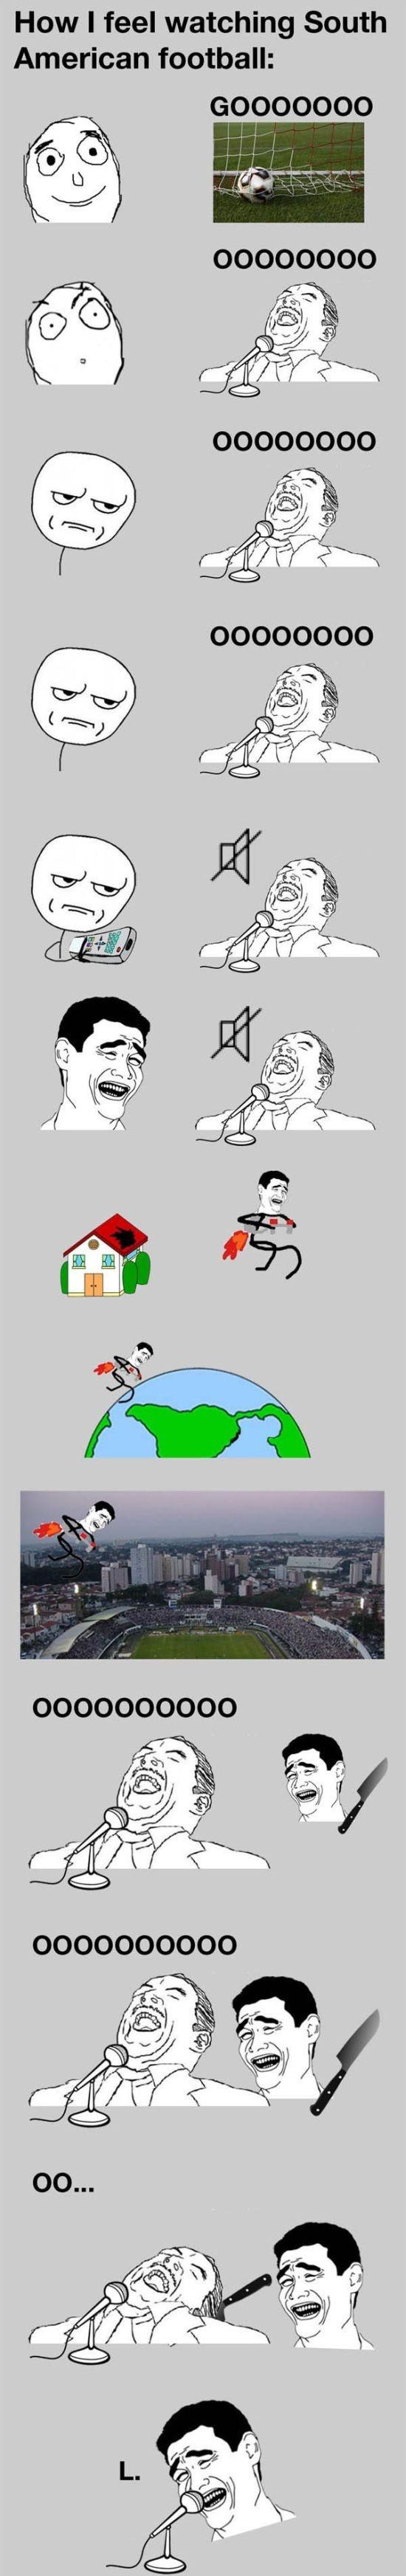 meme comics south american football commentators